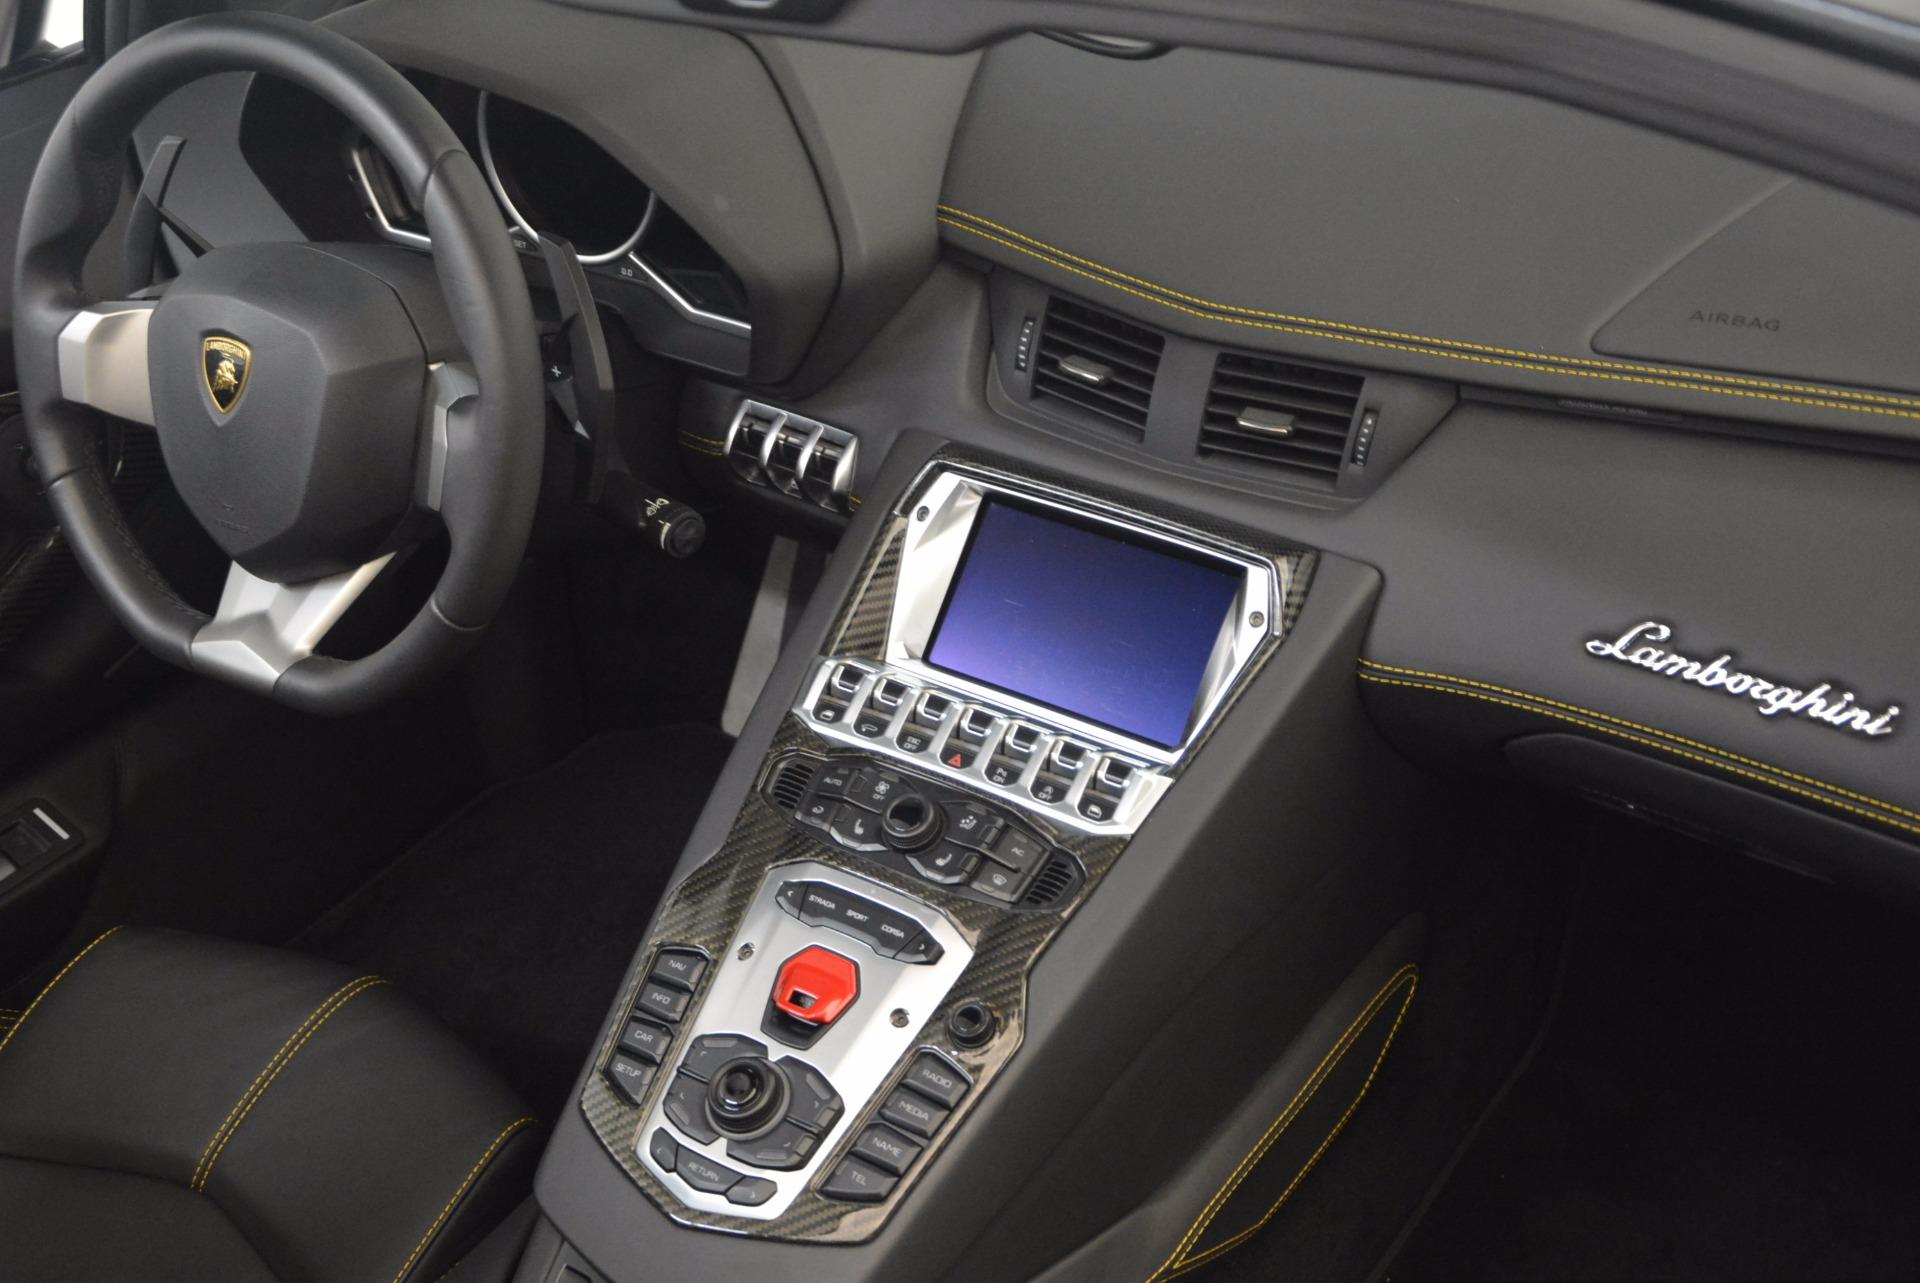 Used 2015 Lamborghini Aventador LP 700-4 For Sale In Westport, CT 1217_p31